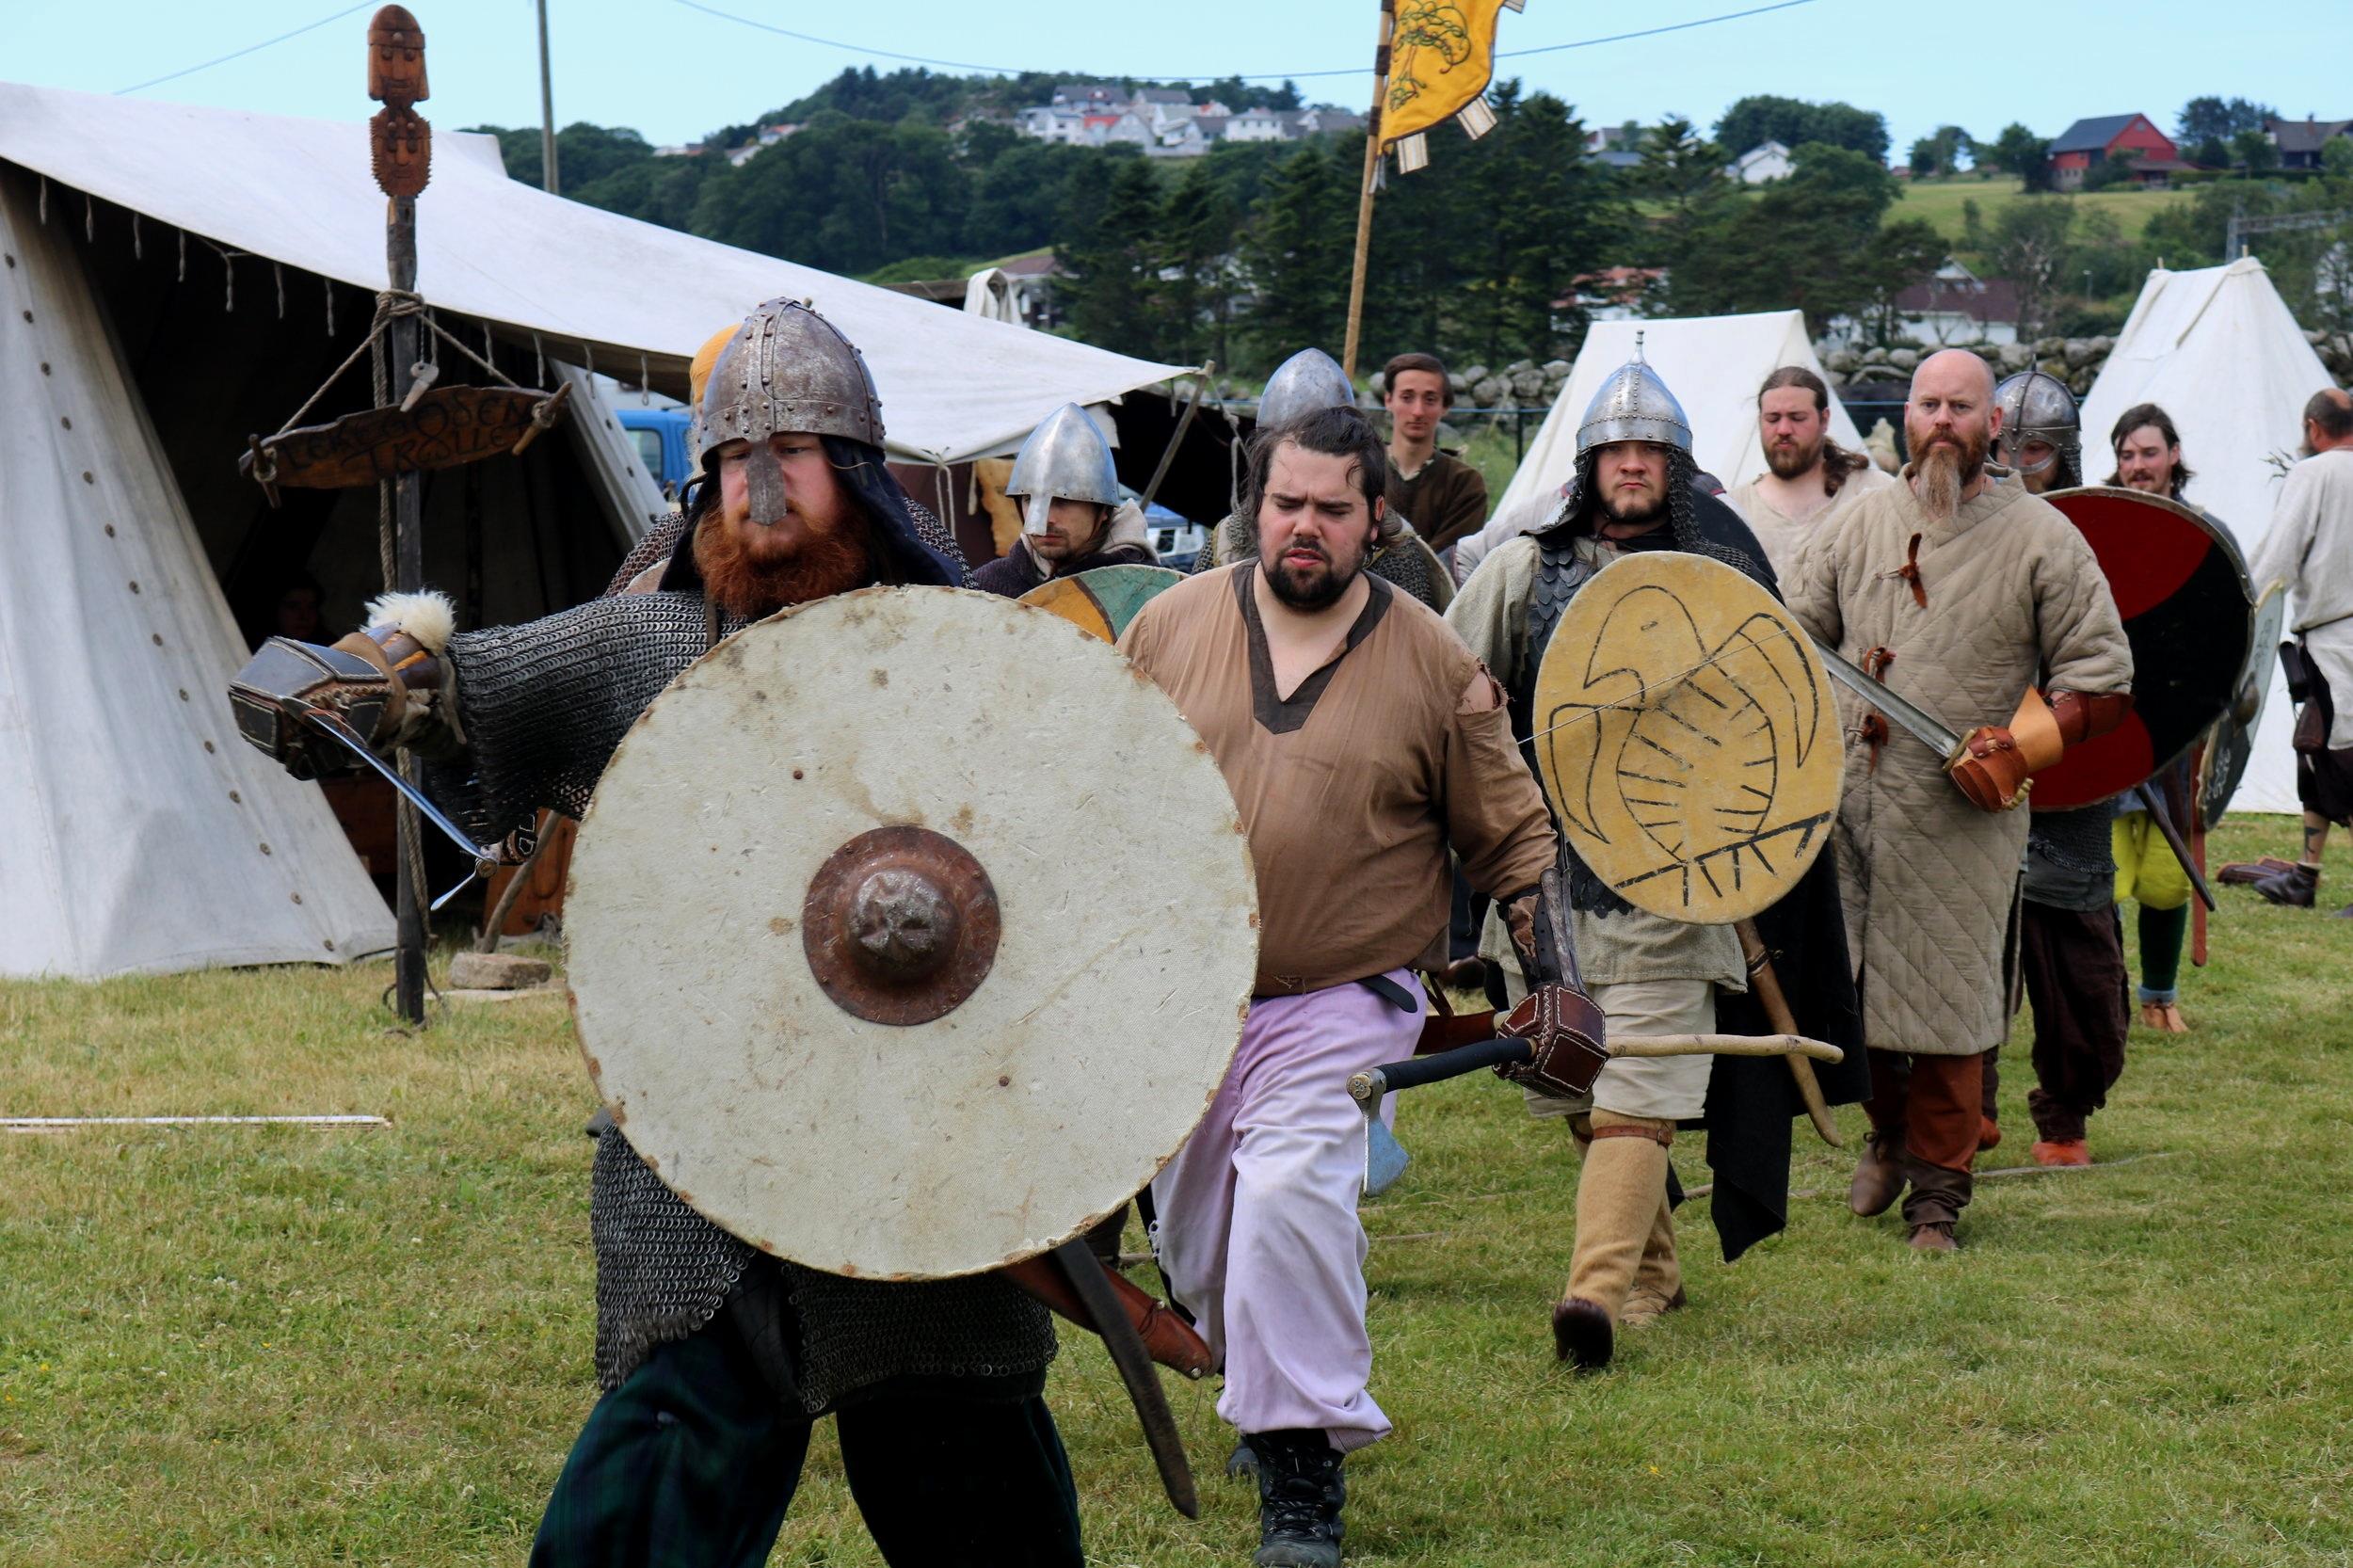 are all scandinavians vikings